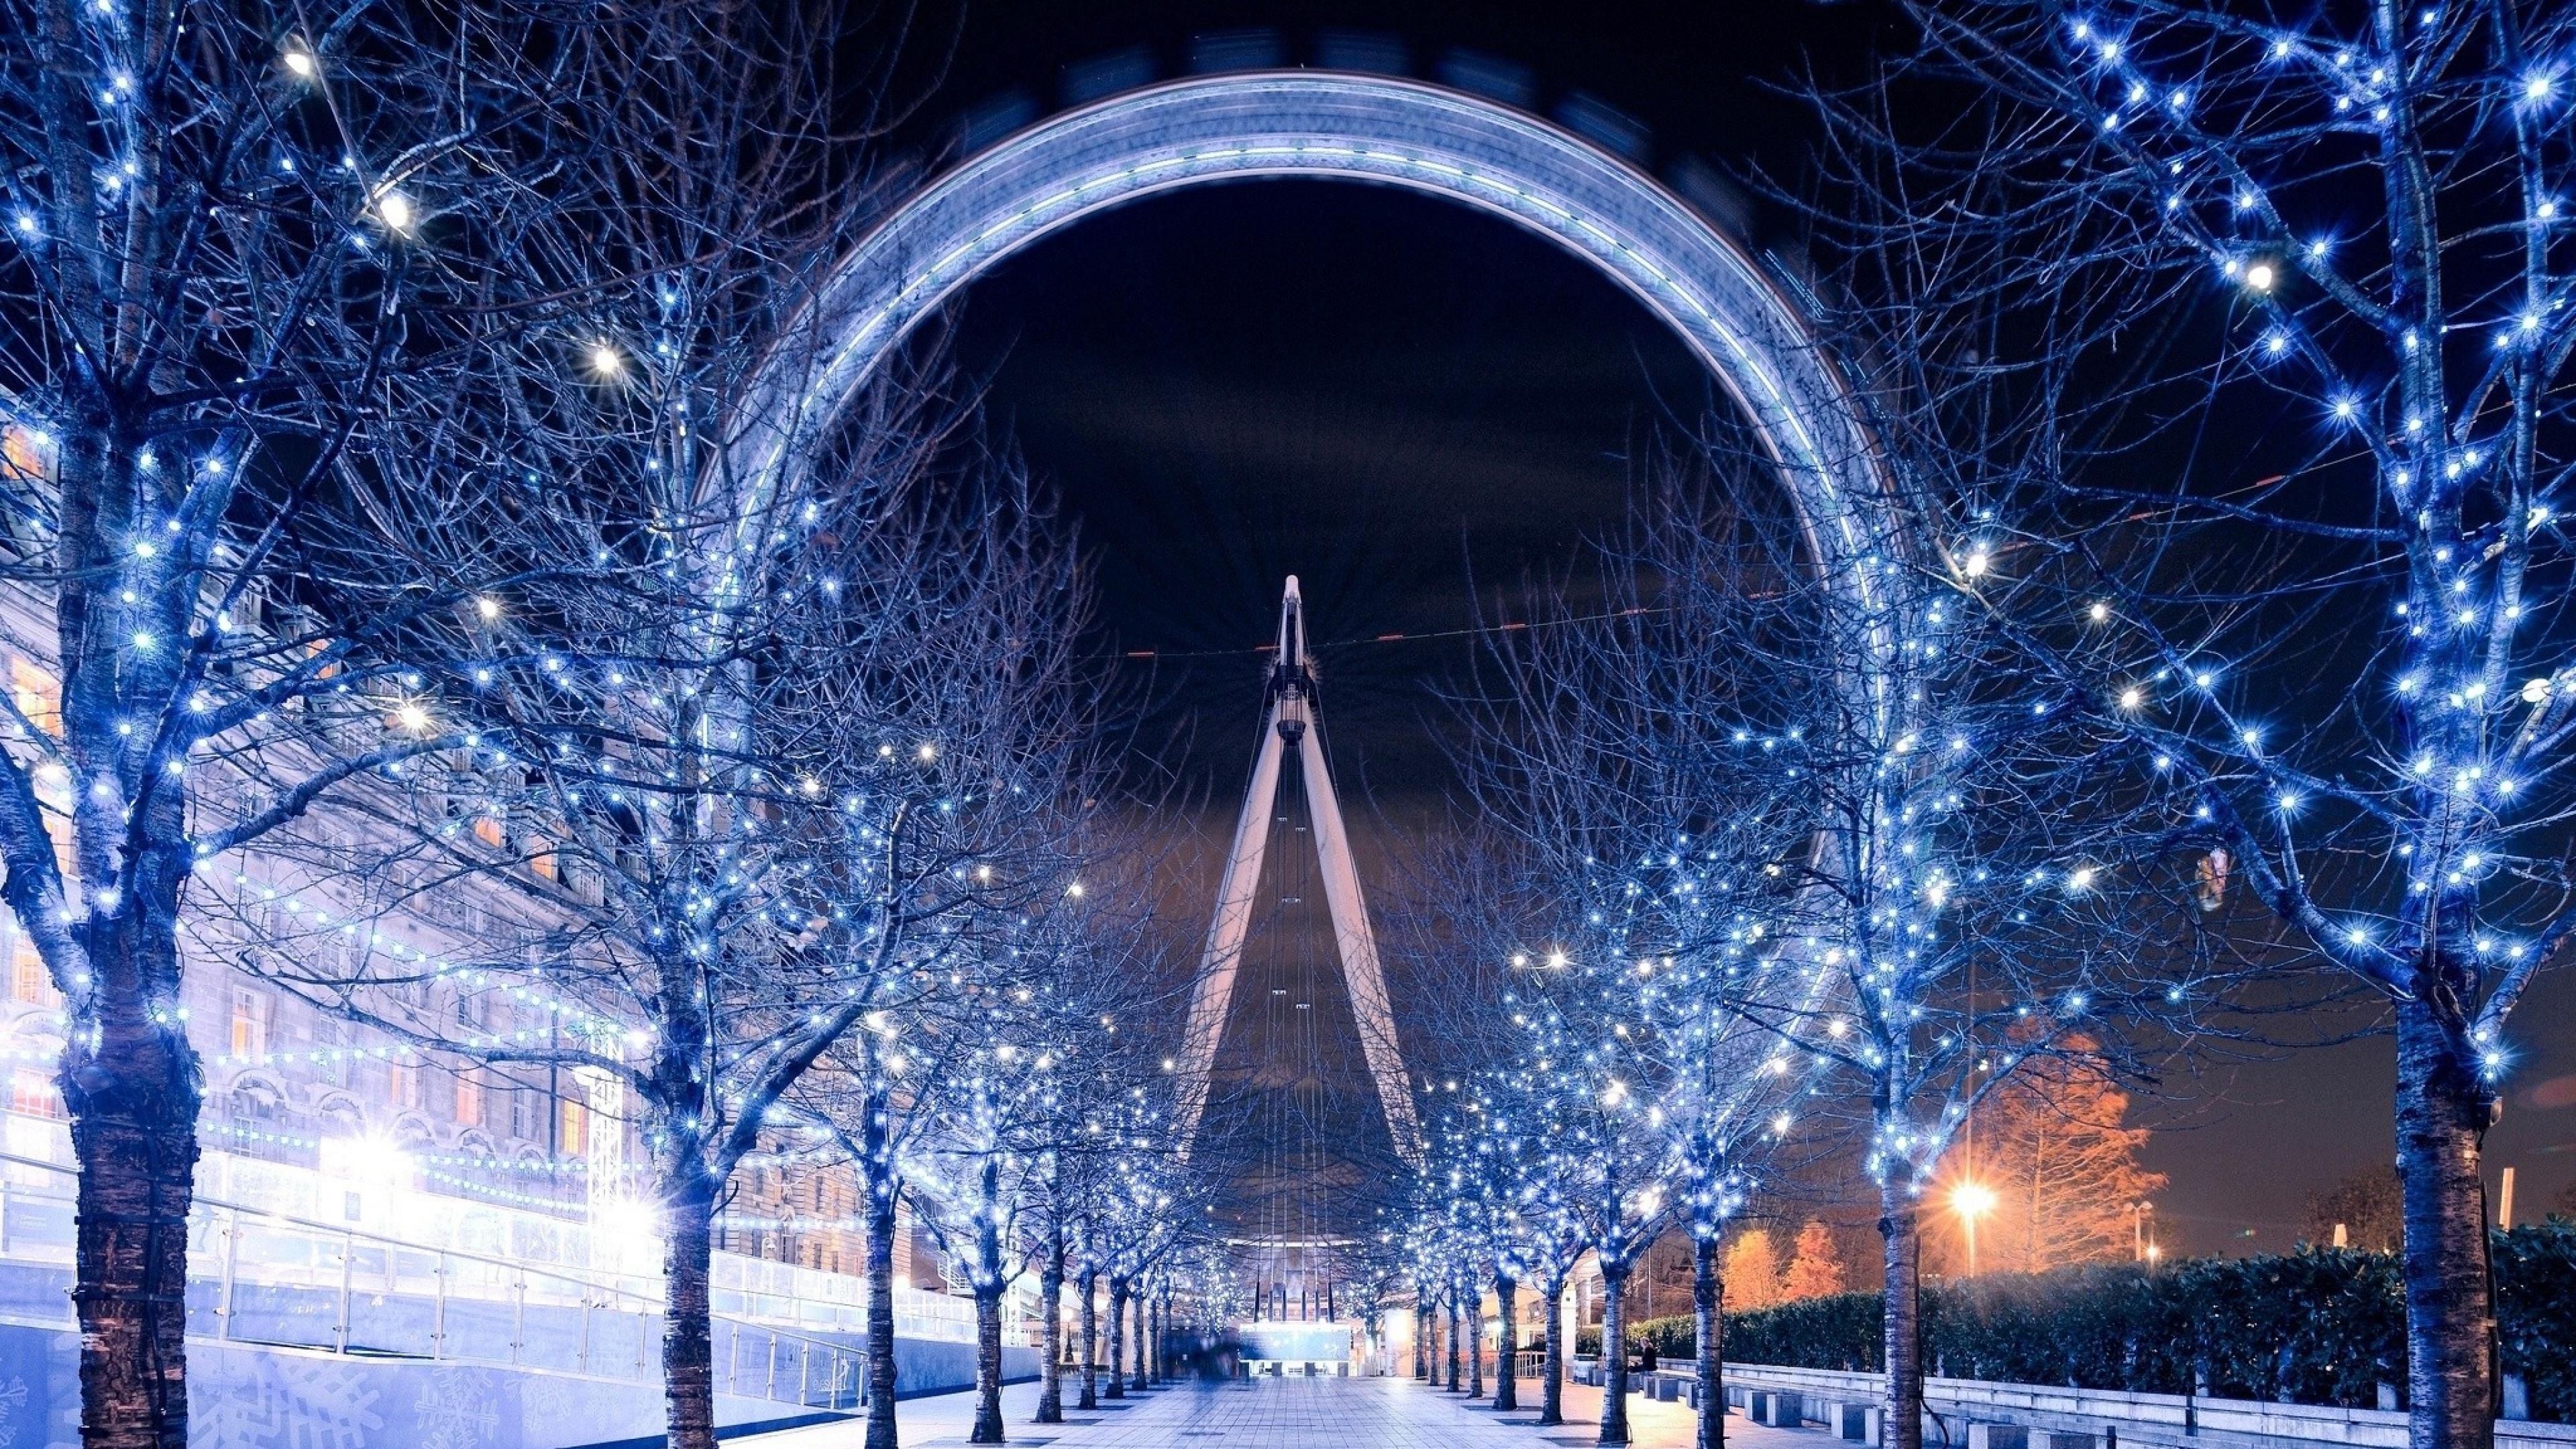 4k Wallpaper 3d 3840x2400 Ferris Wheel London Hd World 4k Wallpapers Images